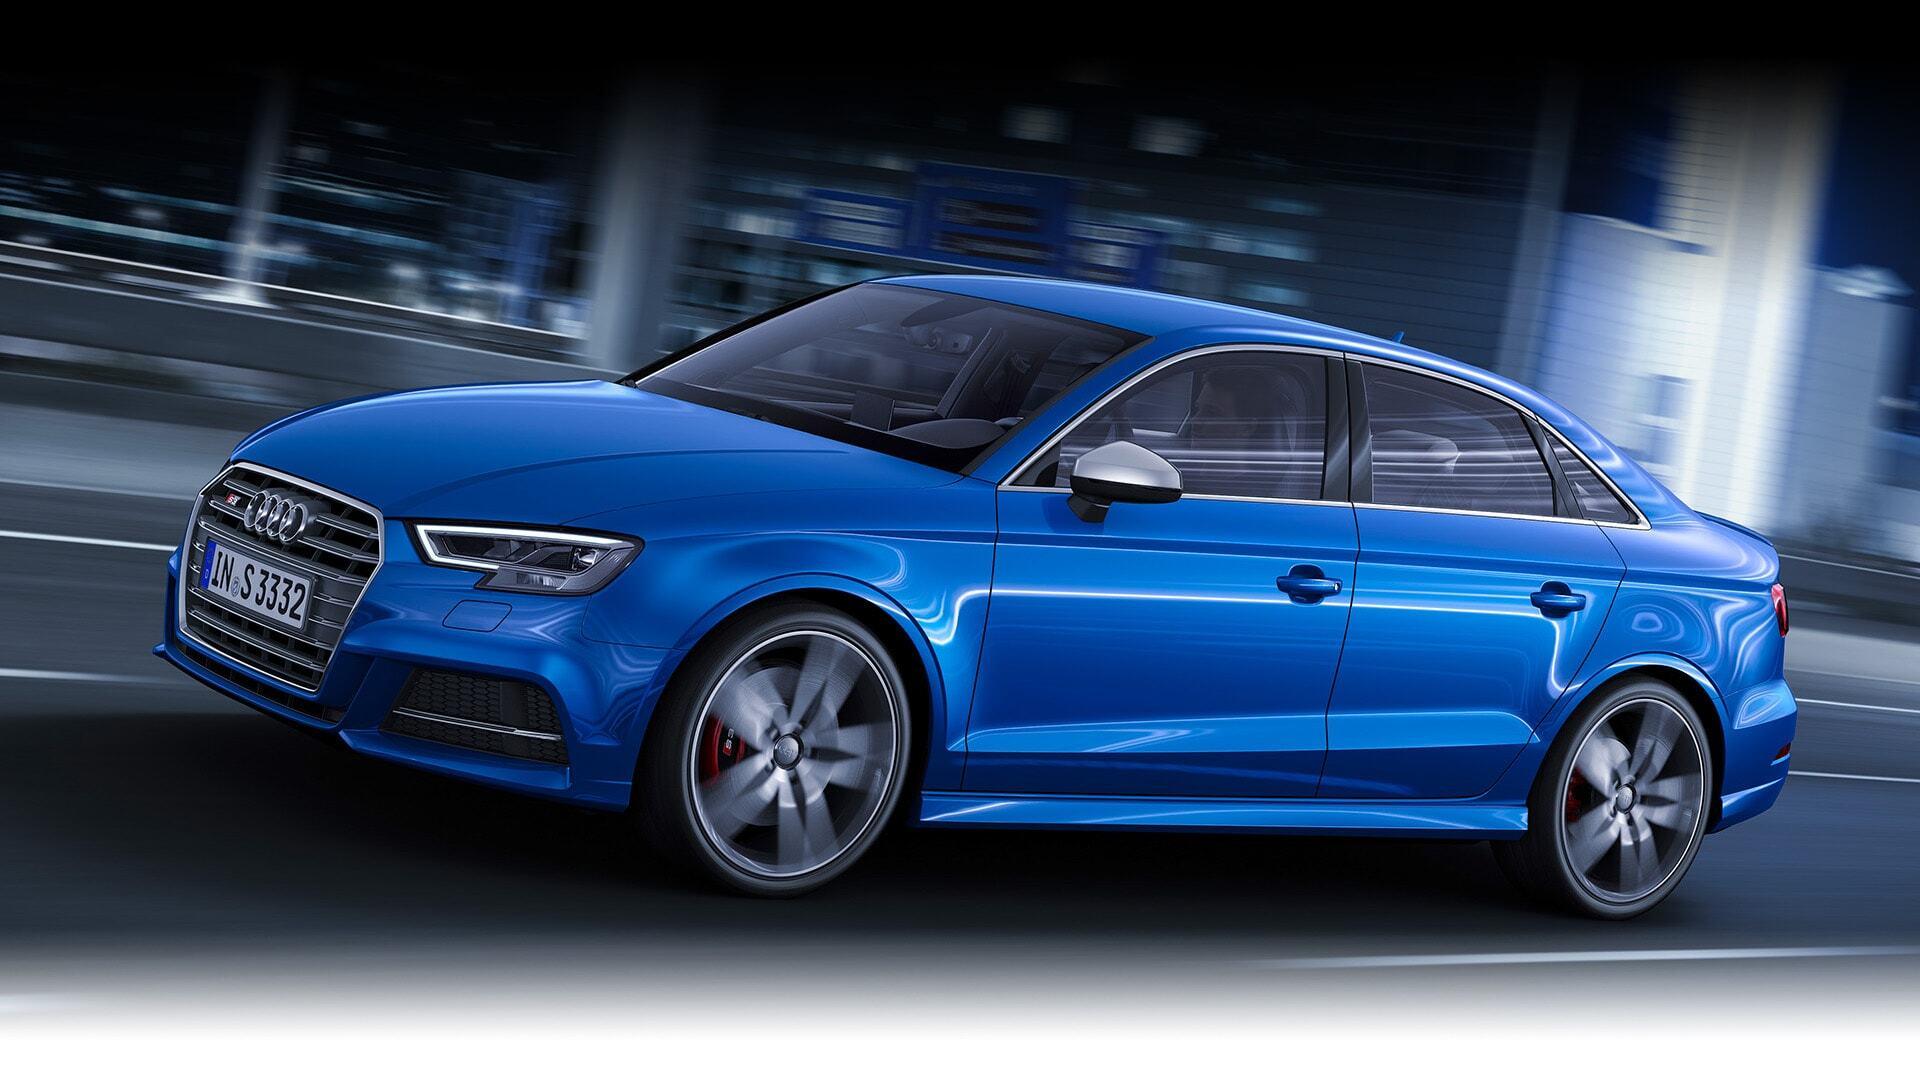 The New 2019 Audi S3 Sedan digital dashboard